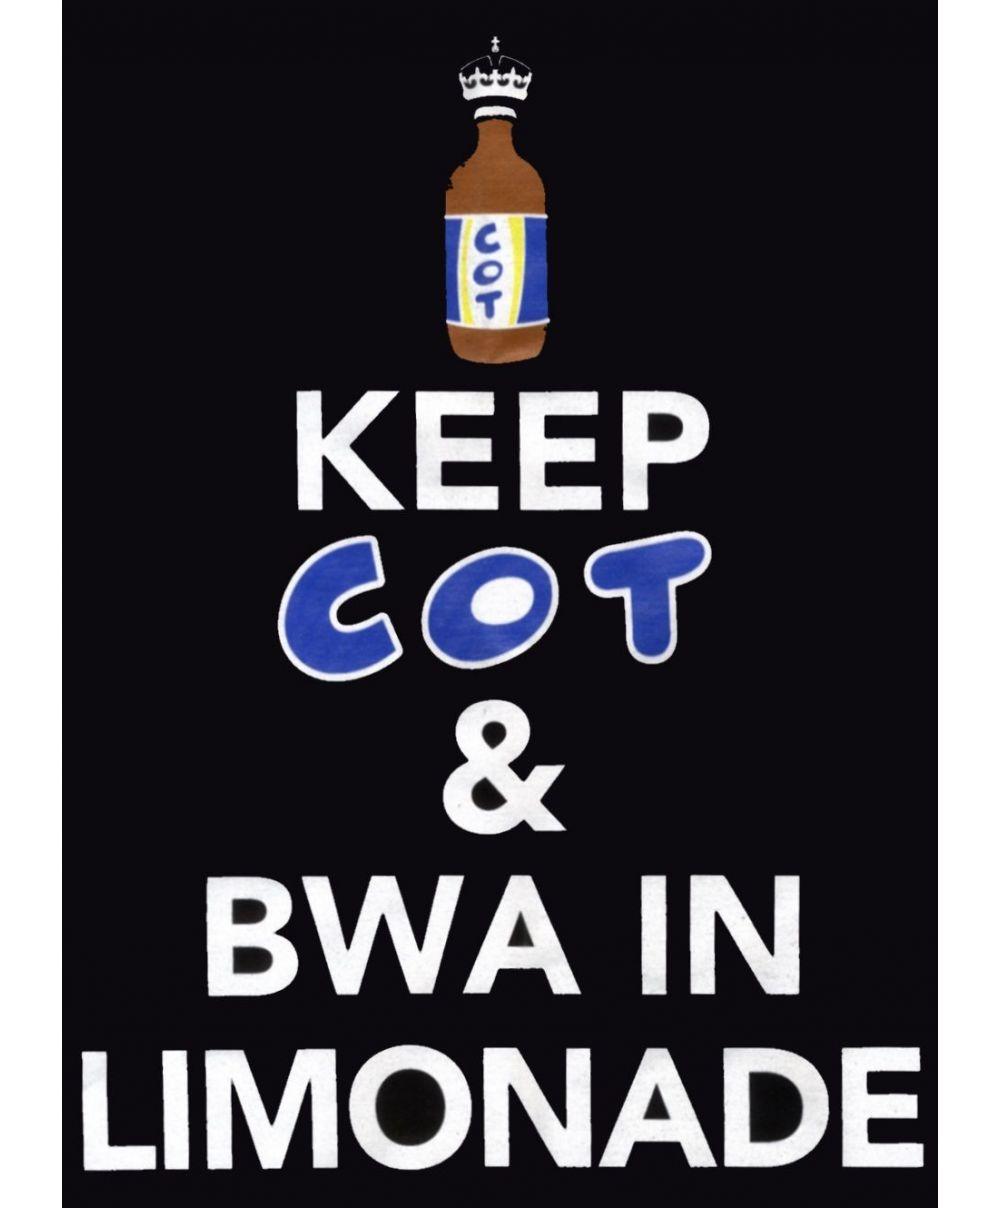 Keep cot